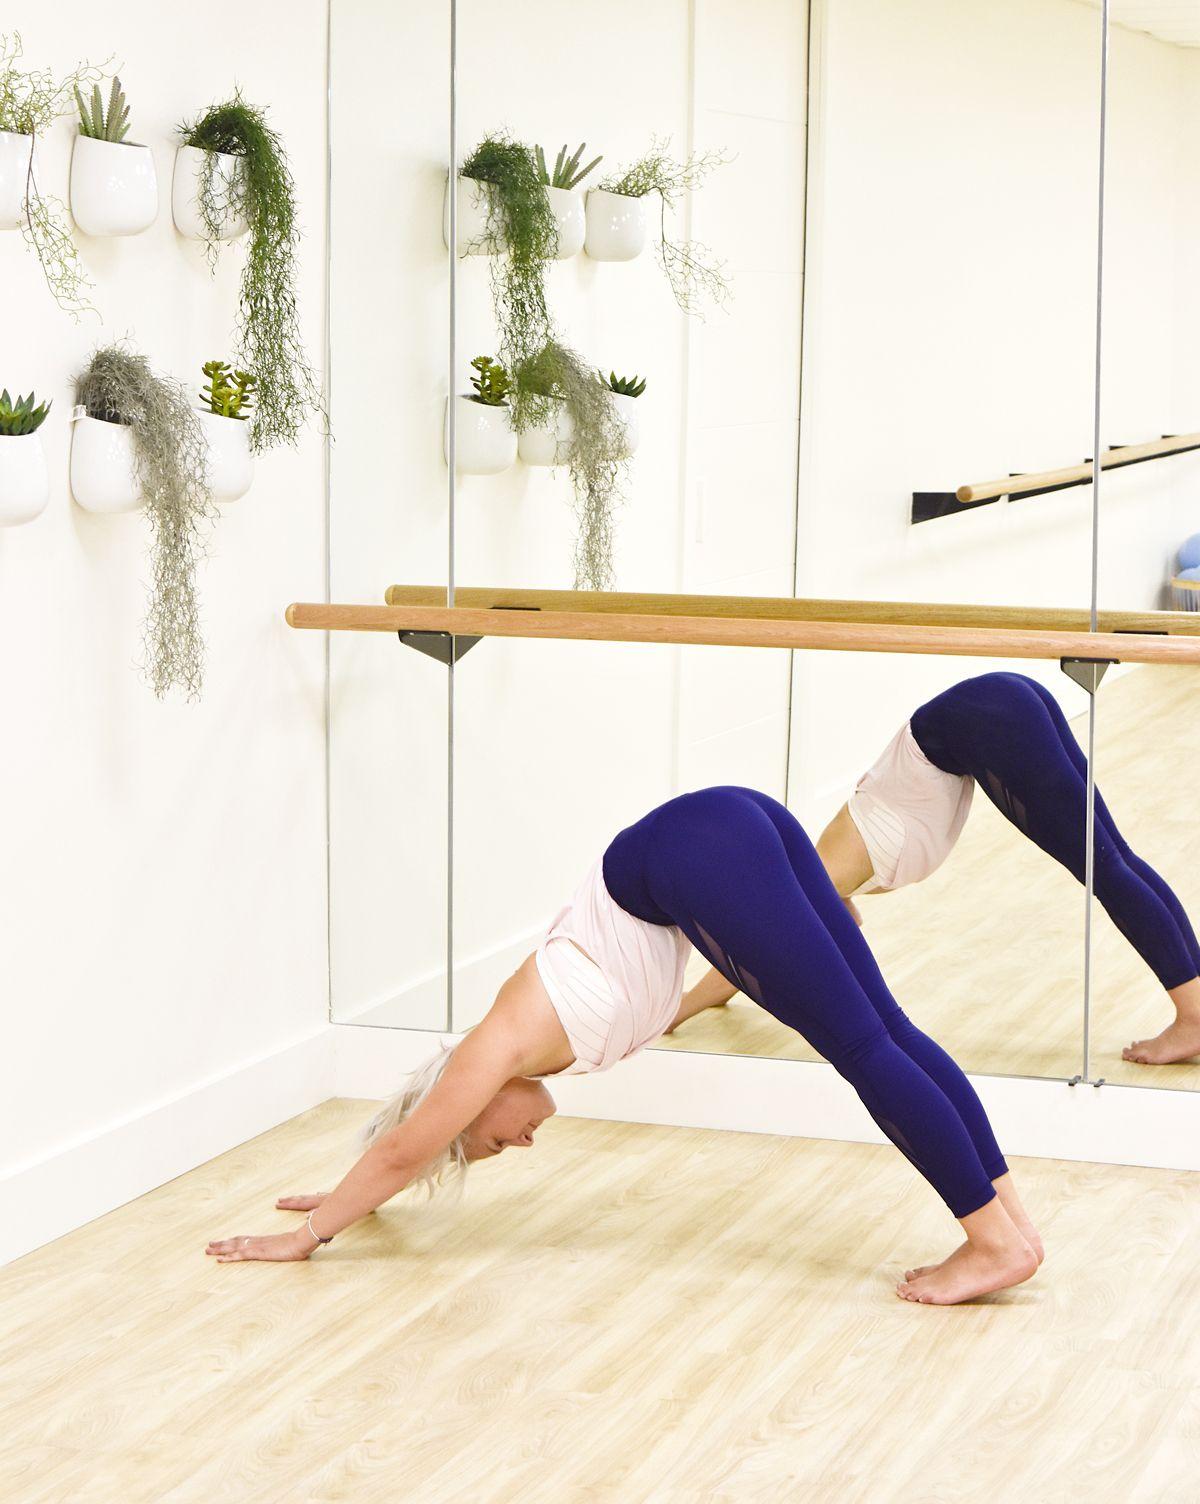 6 Amazing Benefits from Practicing Downward Dog. Yoga vs